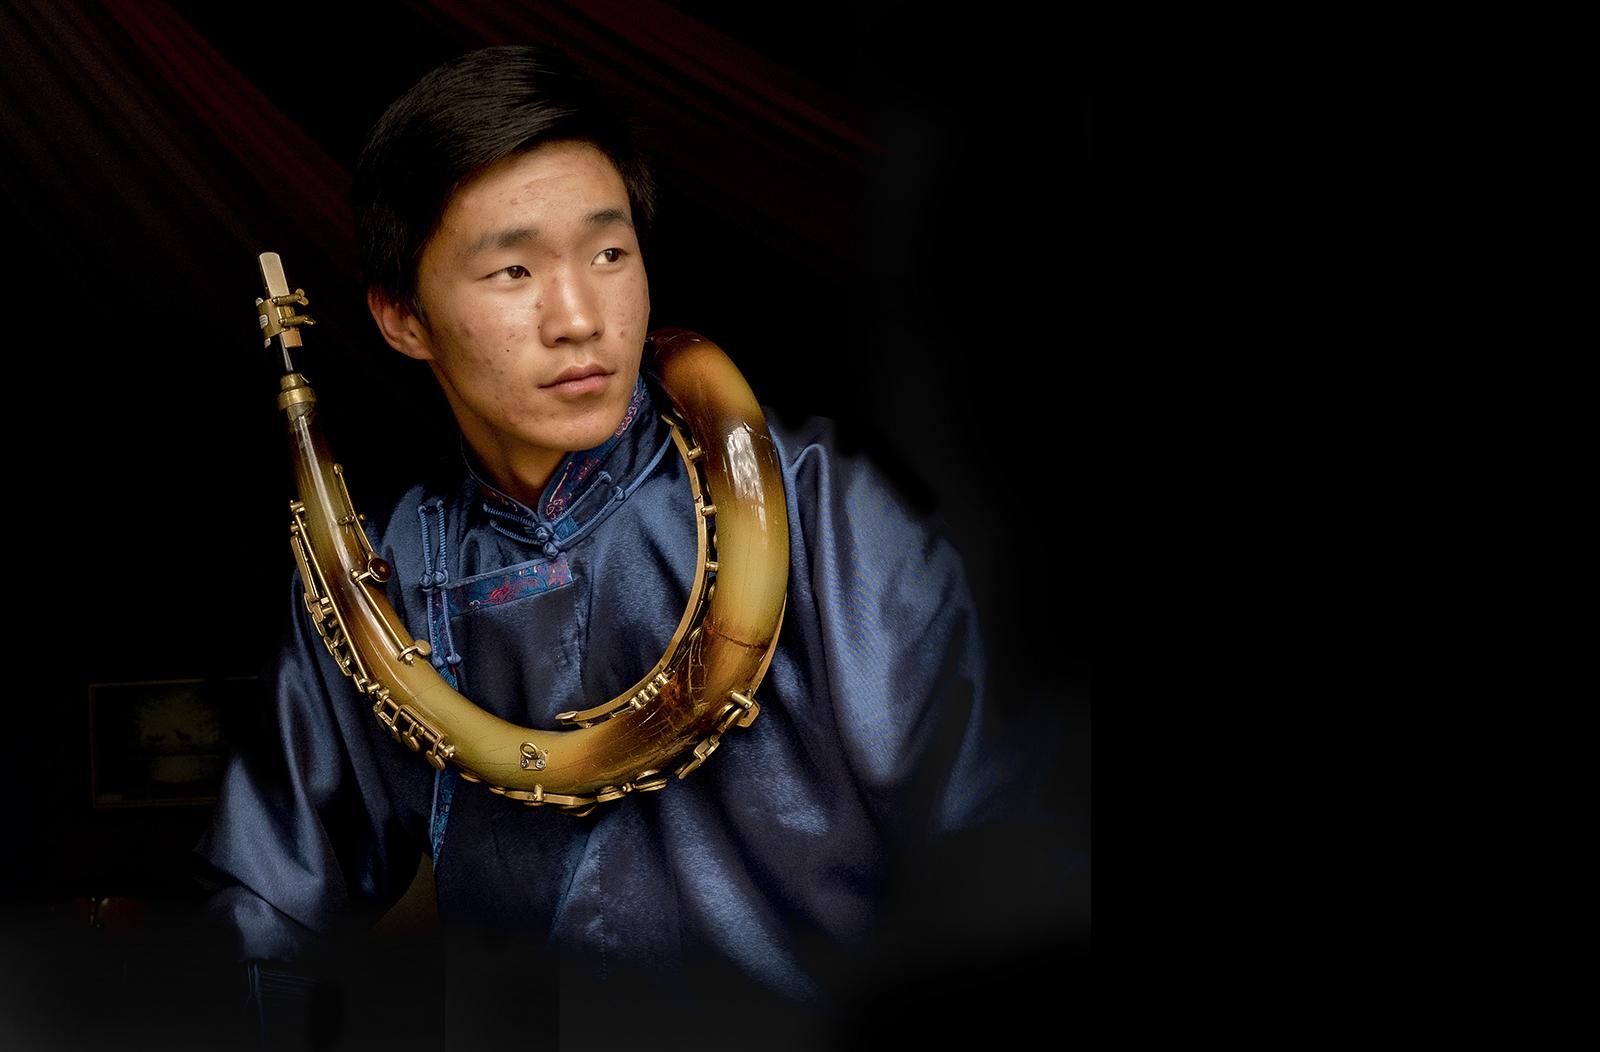 mongolian+horn+musician.jpg